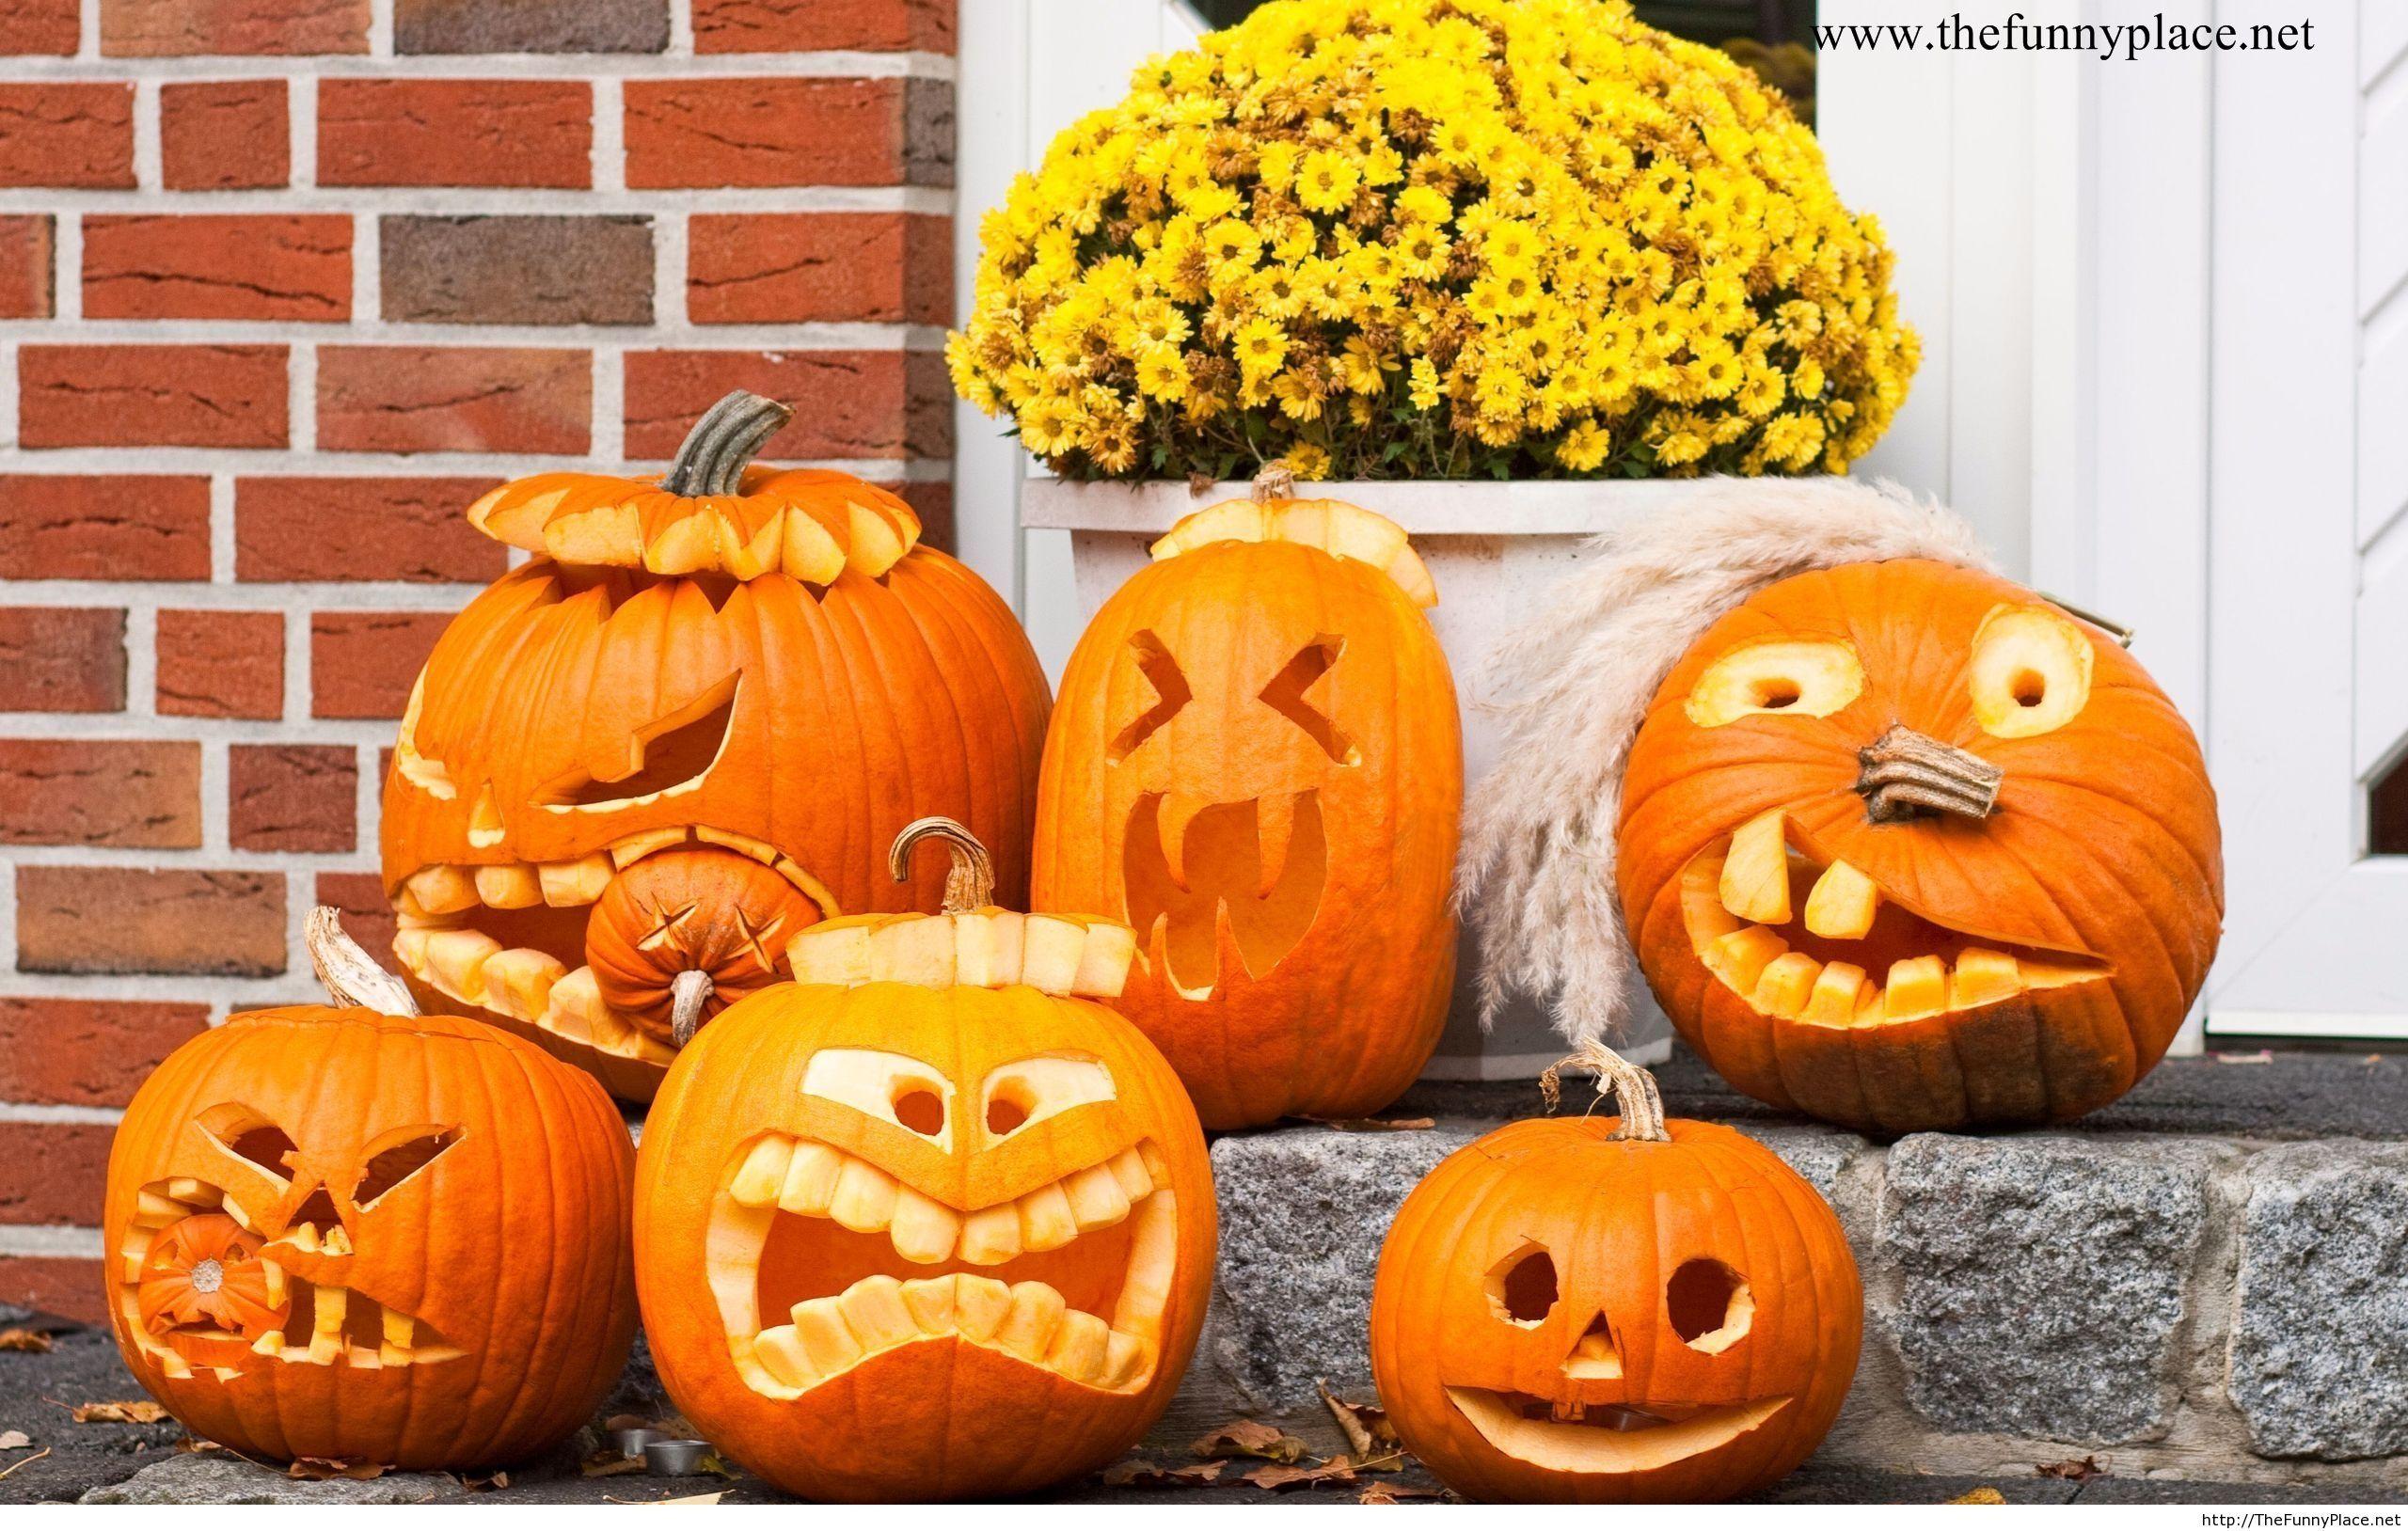 Halloween 2013 funny image